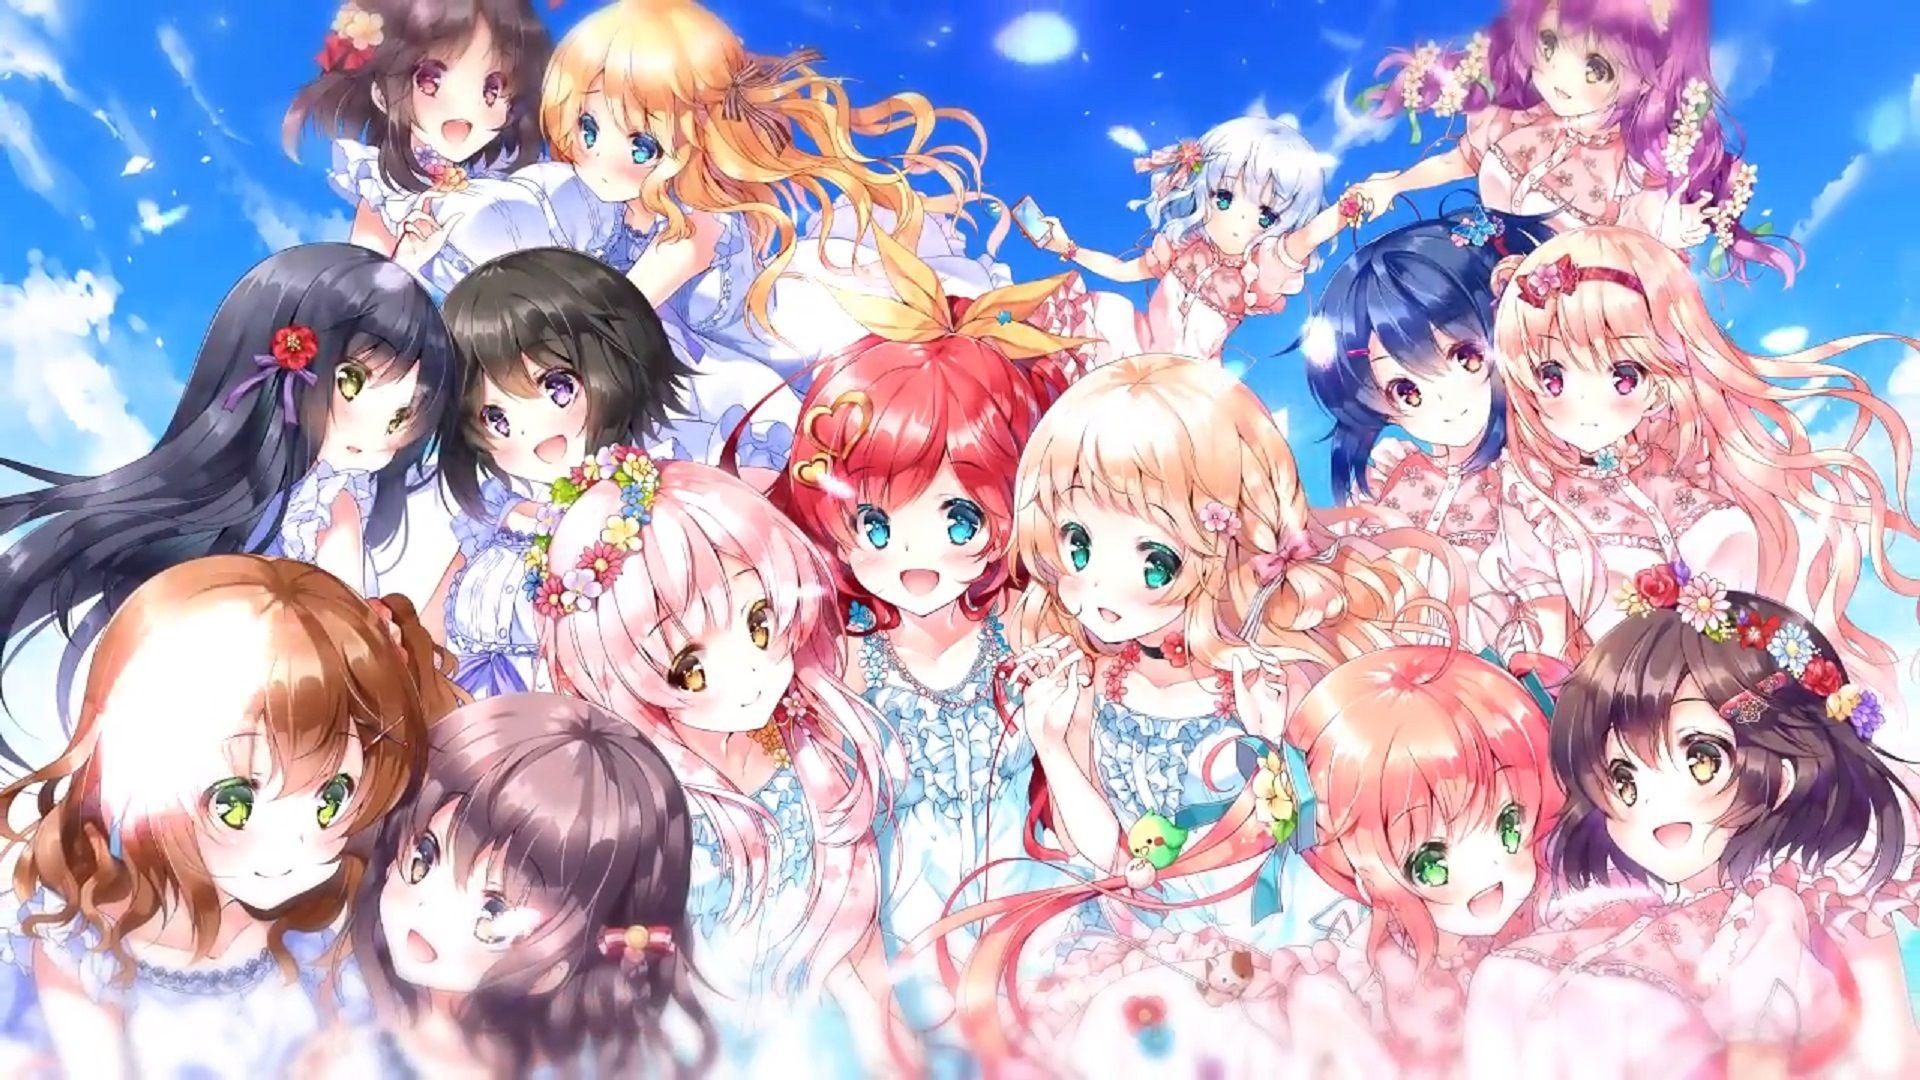 Yuri visual novel games